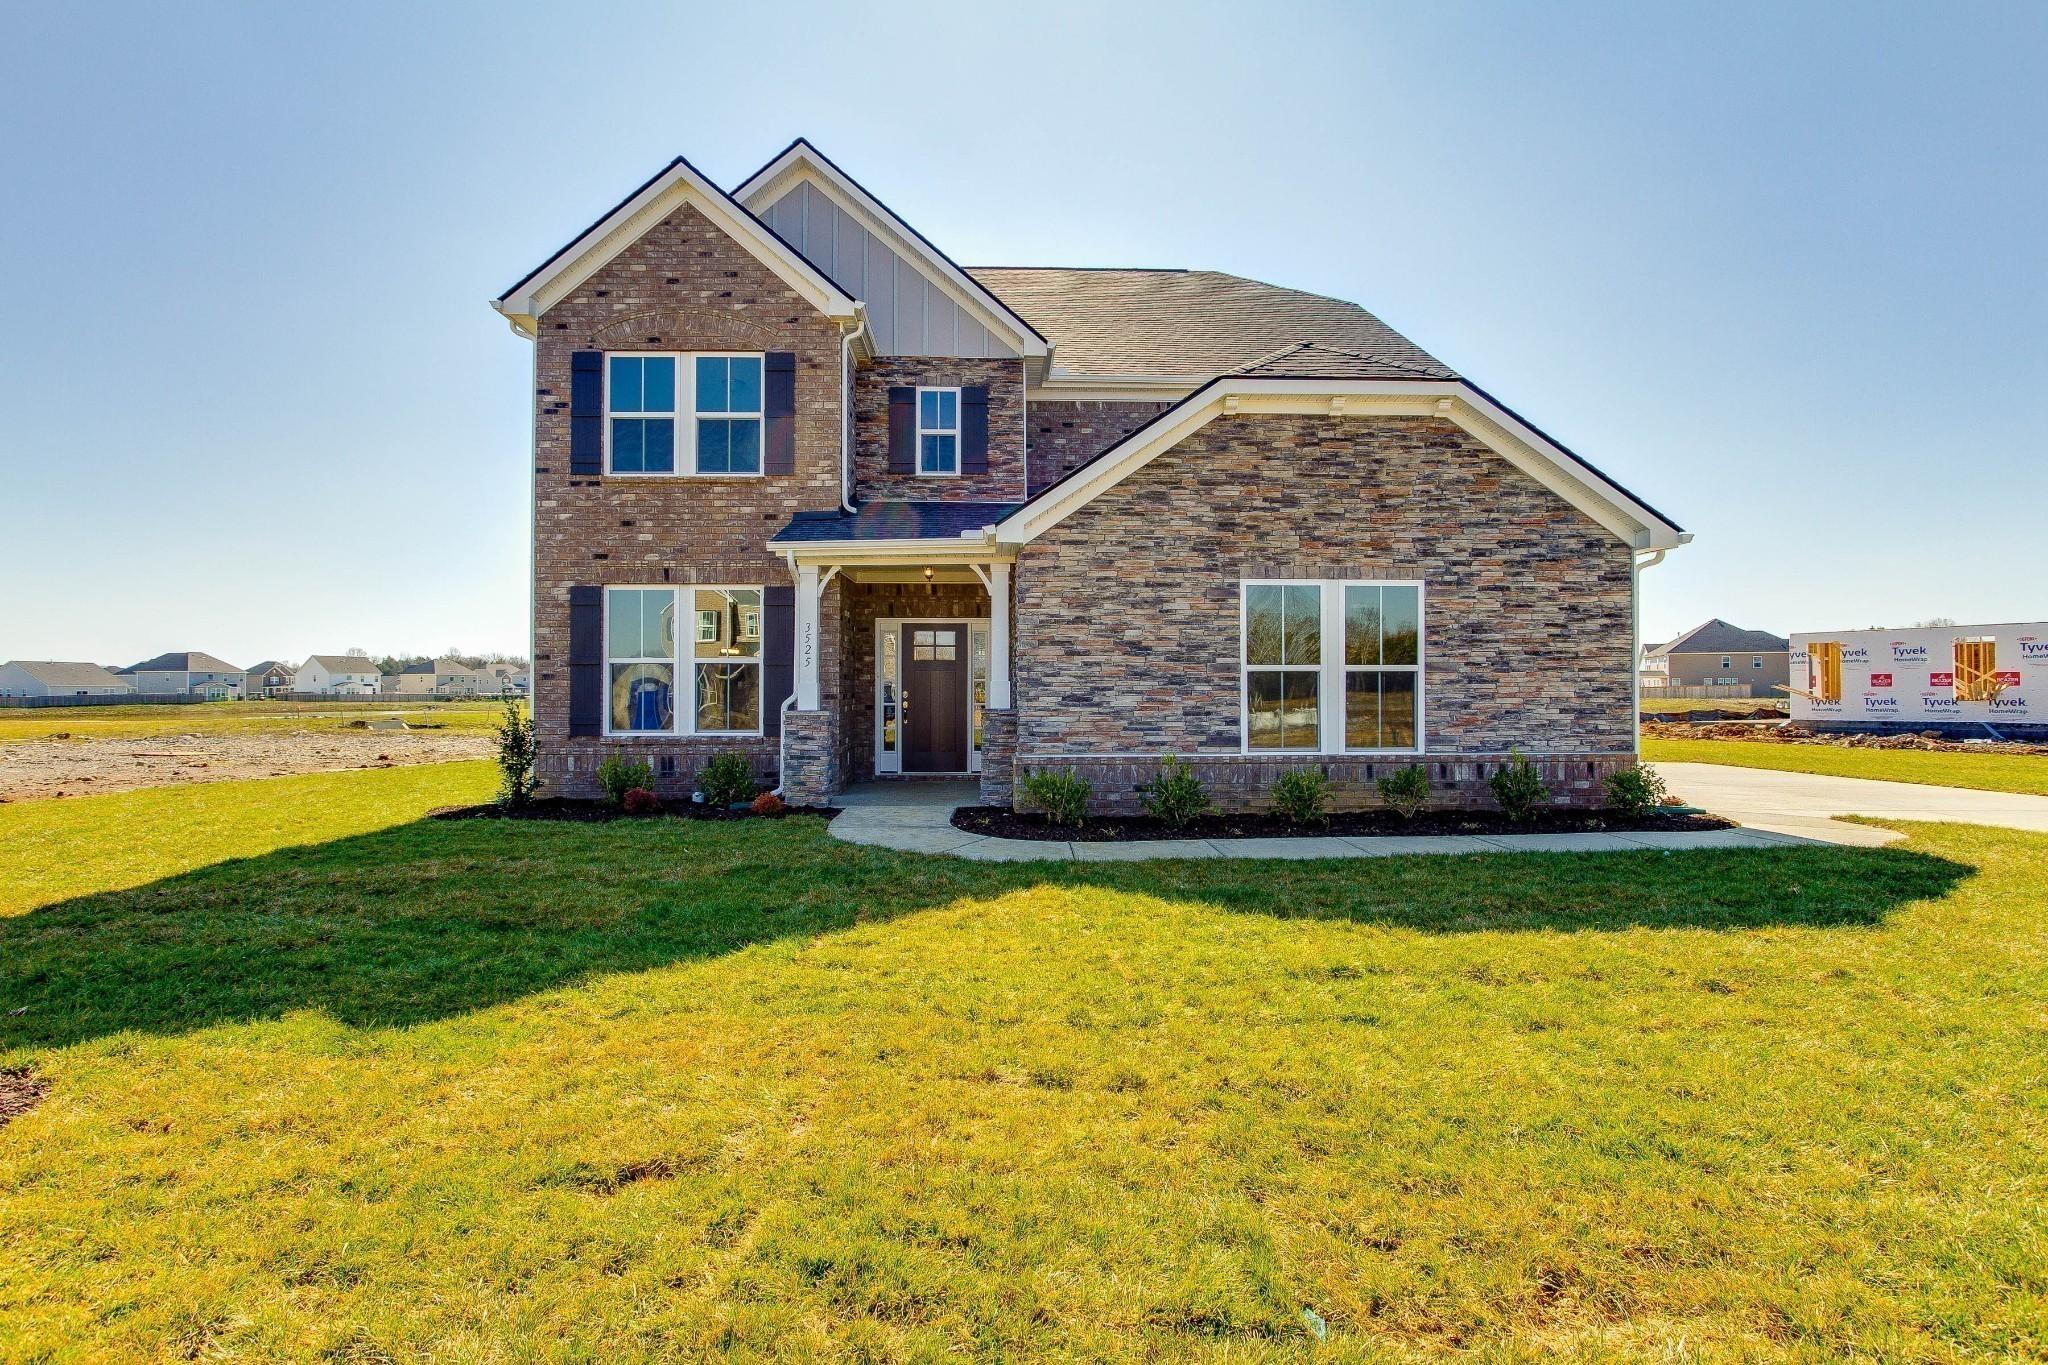 3009 Pomoa Place Property Photo - Murfreesboro, TN real estate listing